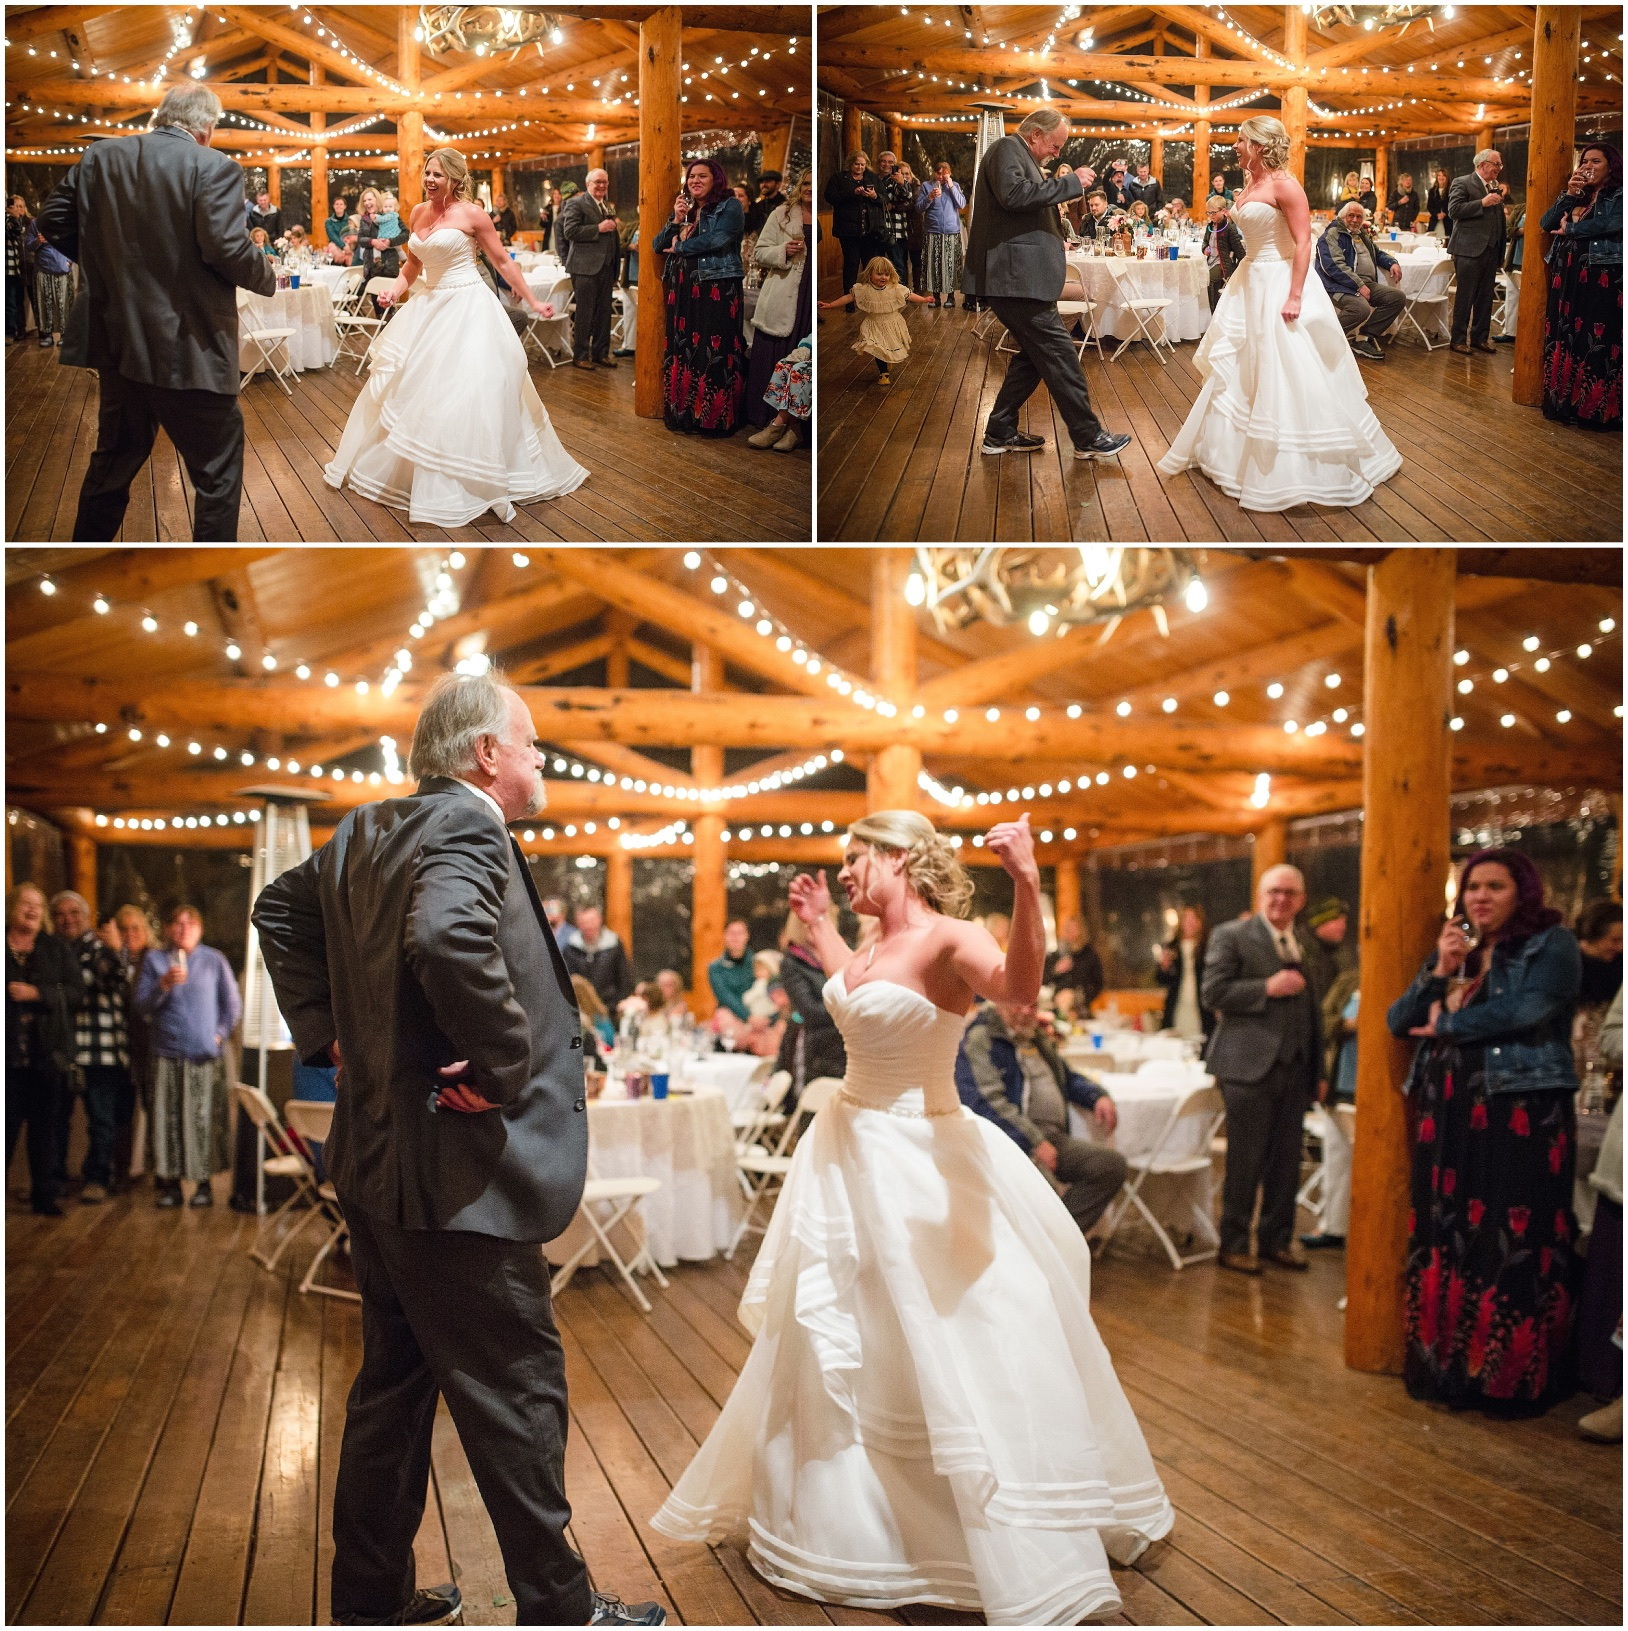 lindseyjane_wedding101.jpg